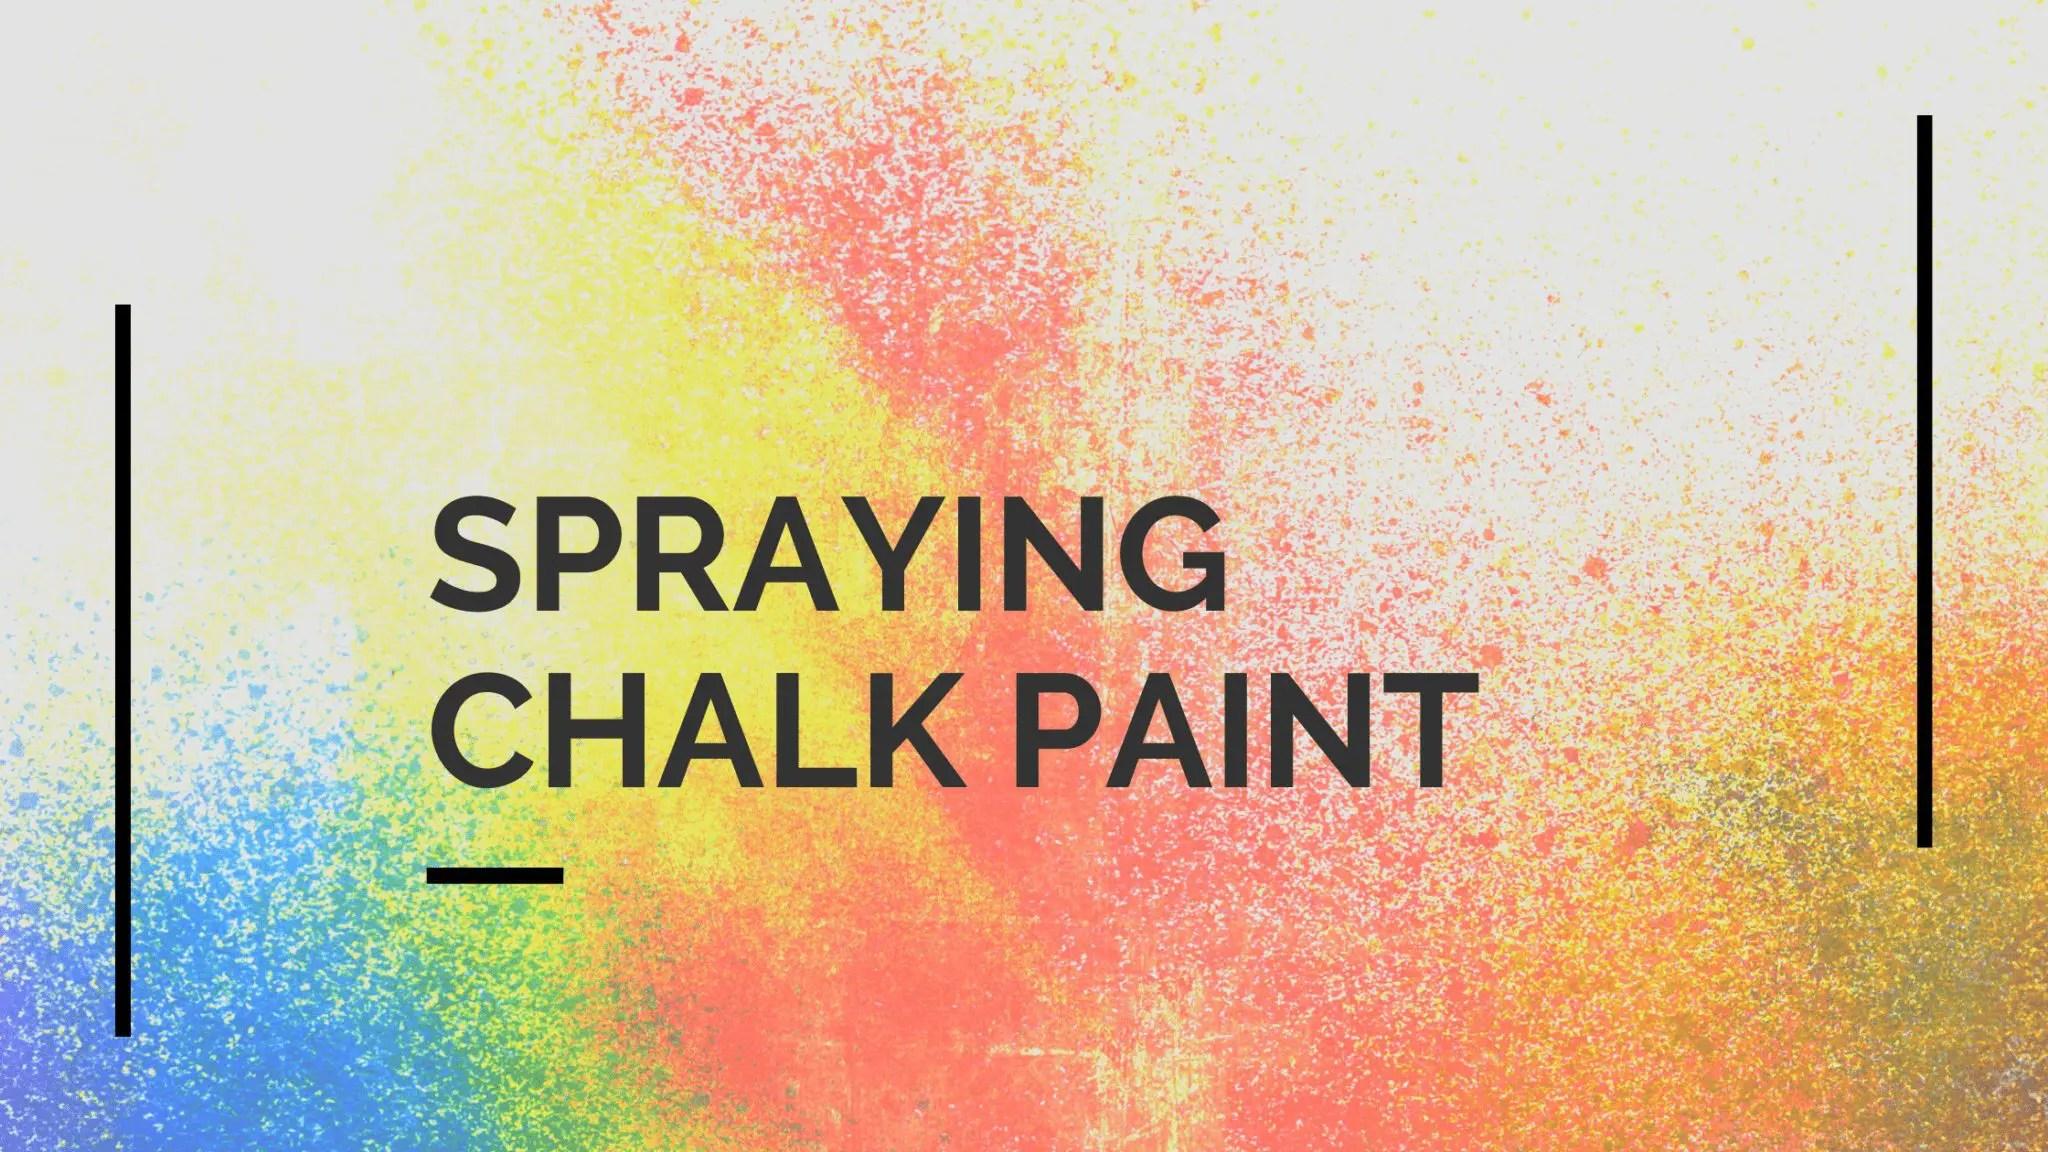 Spraying Chalk Paint